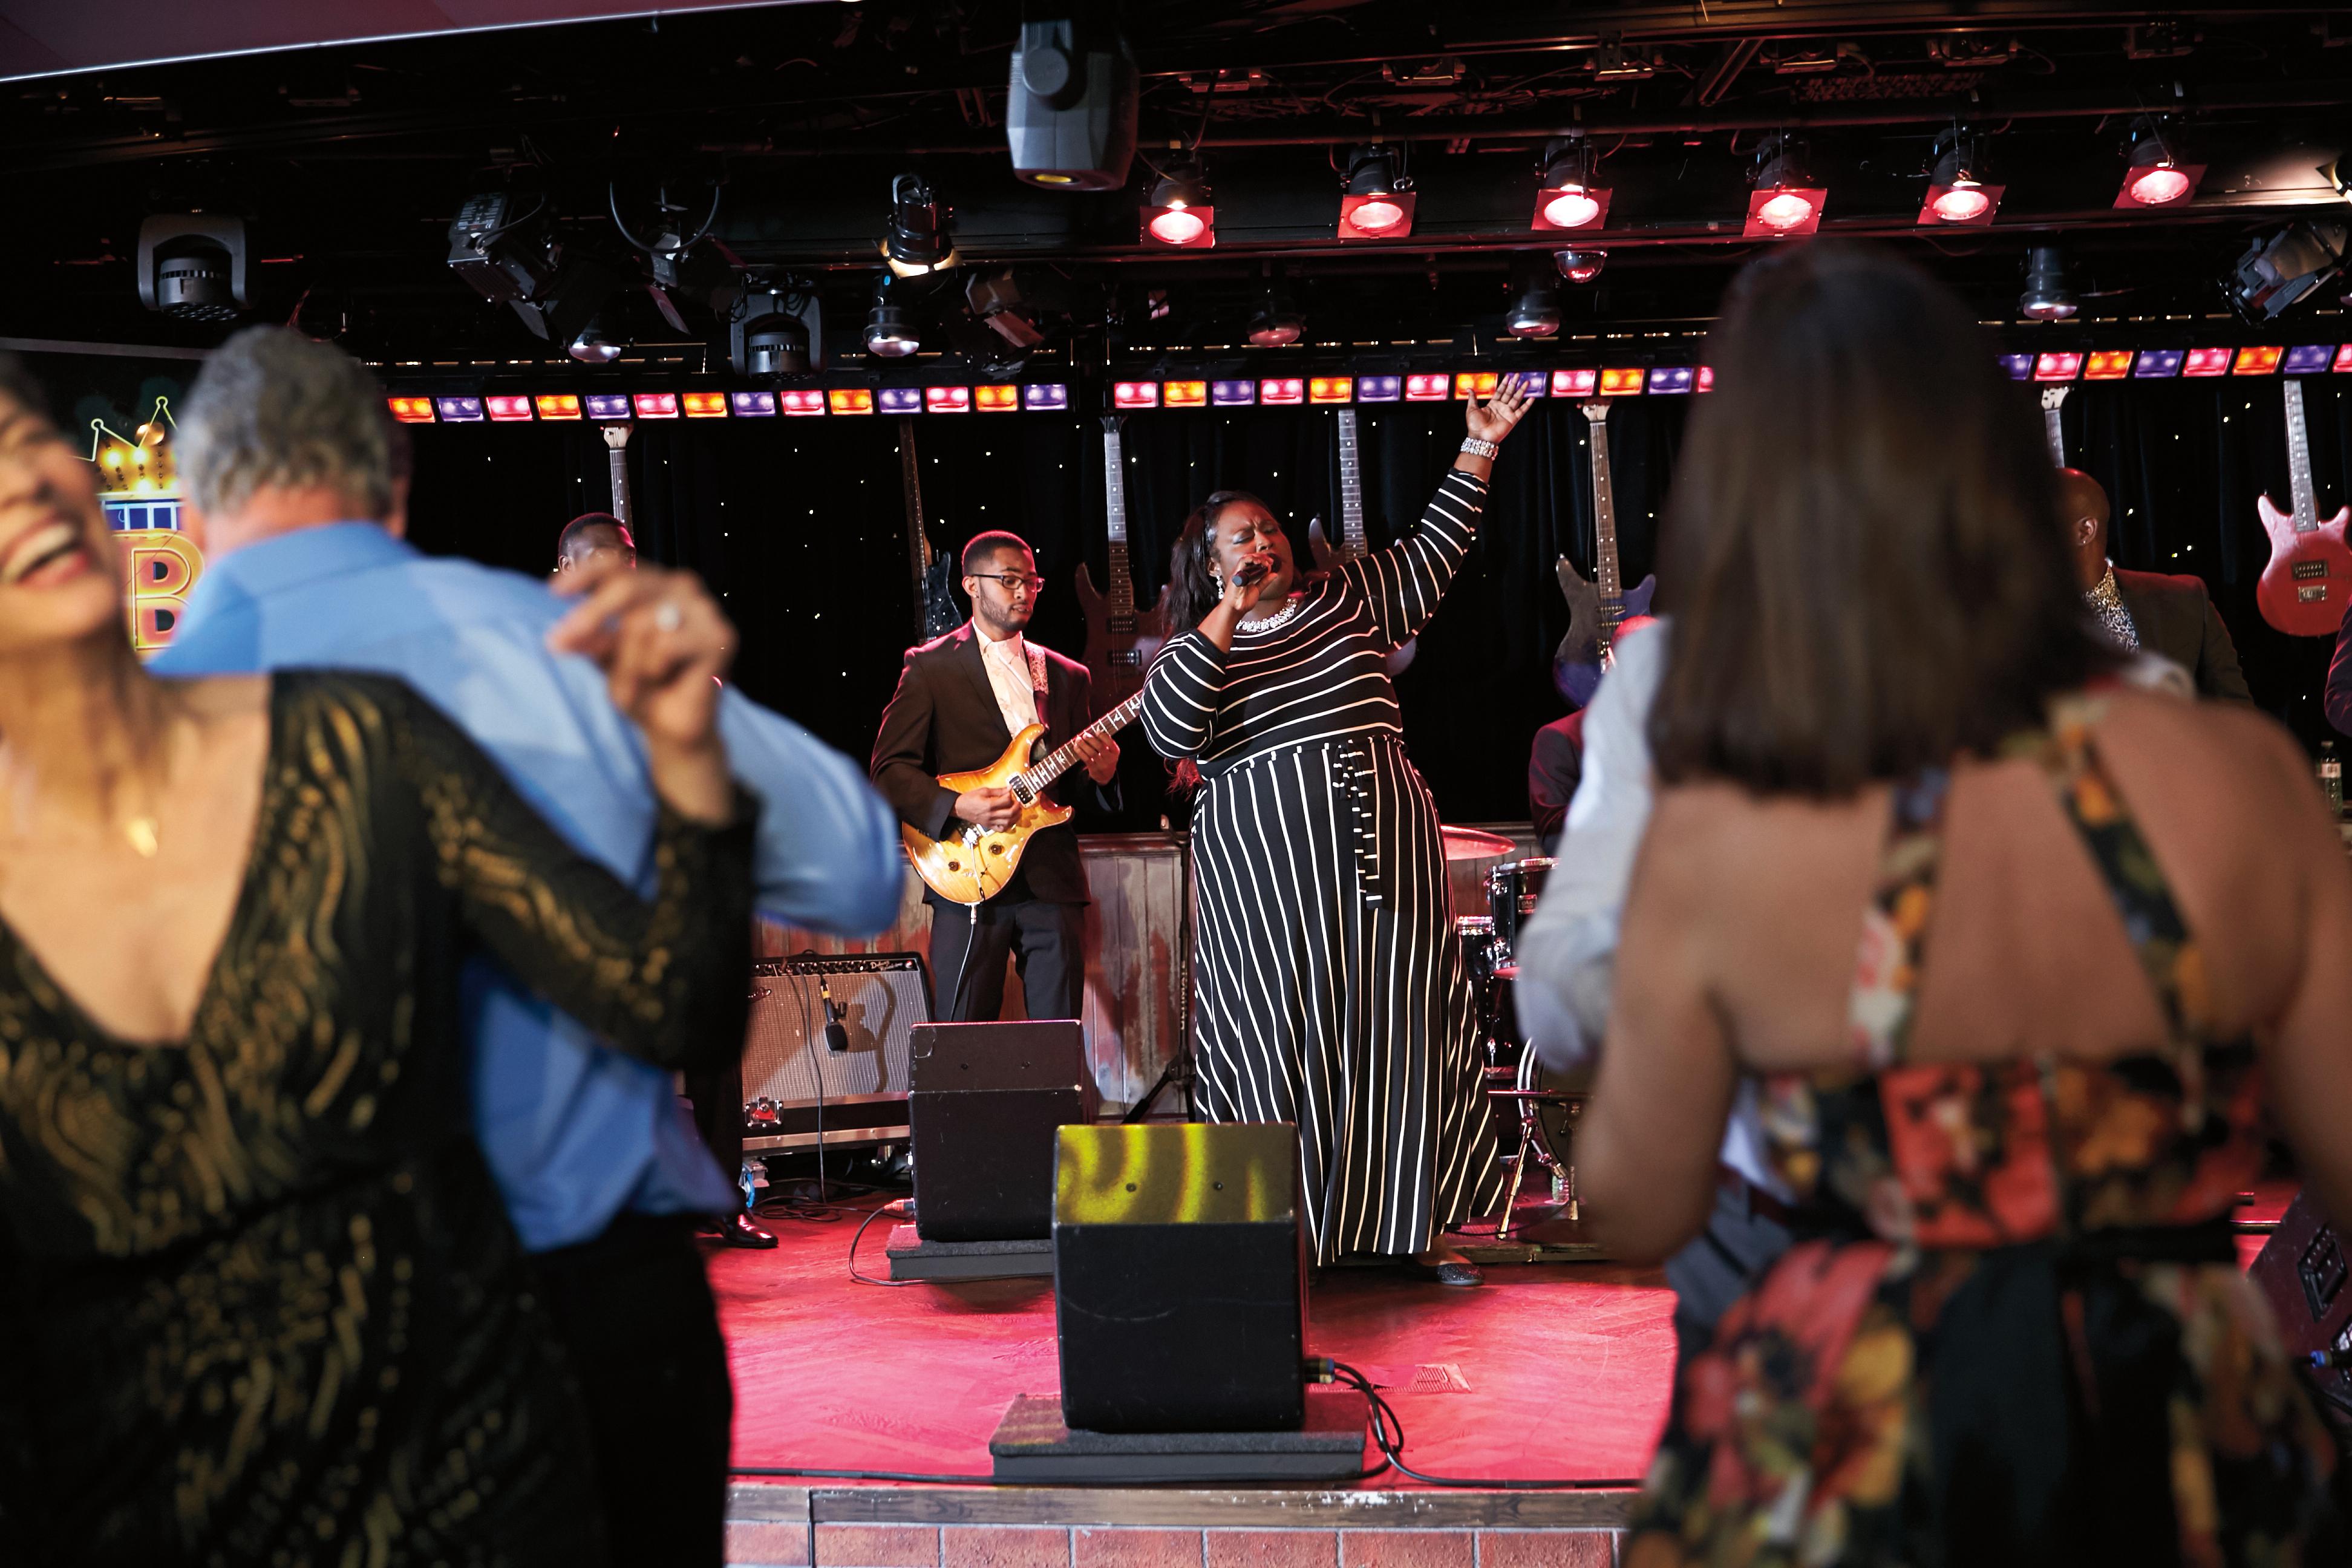 B.B. Kings Blues Nightclub - The Queens Lounge becomes a bit f Memphis at Sea.